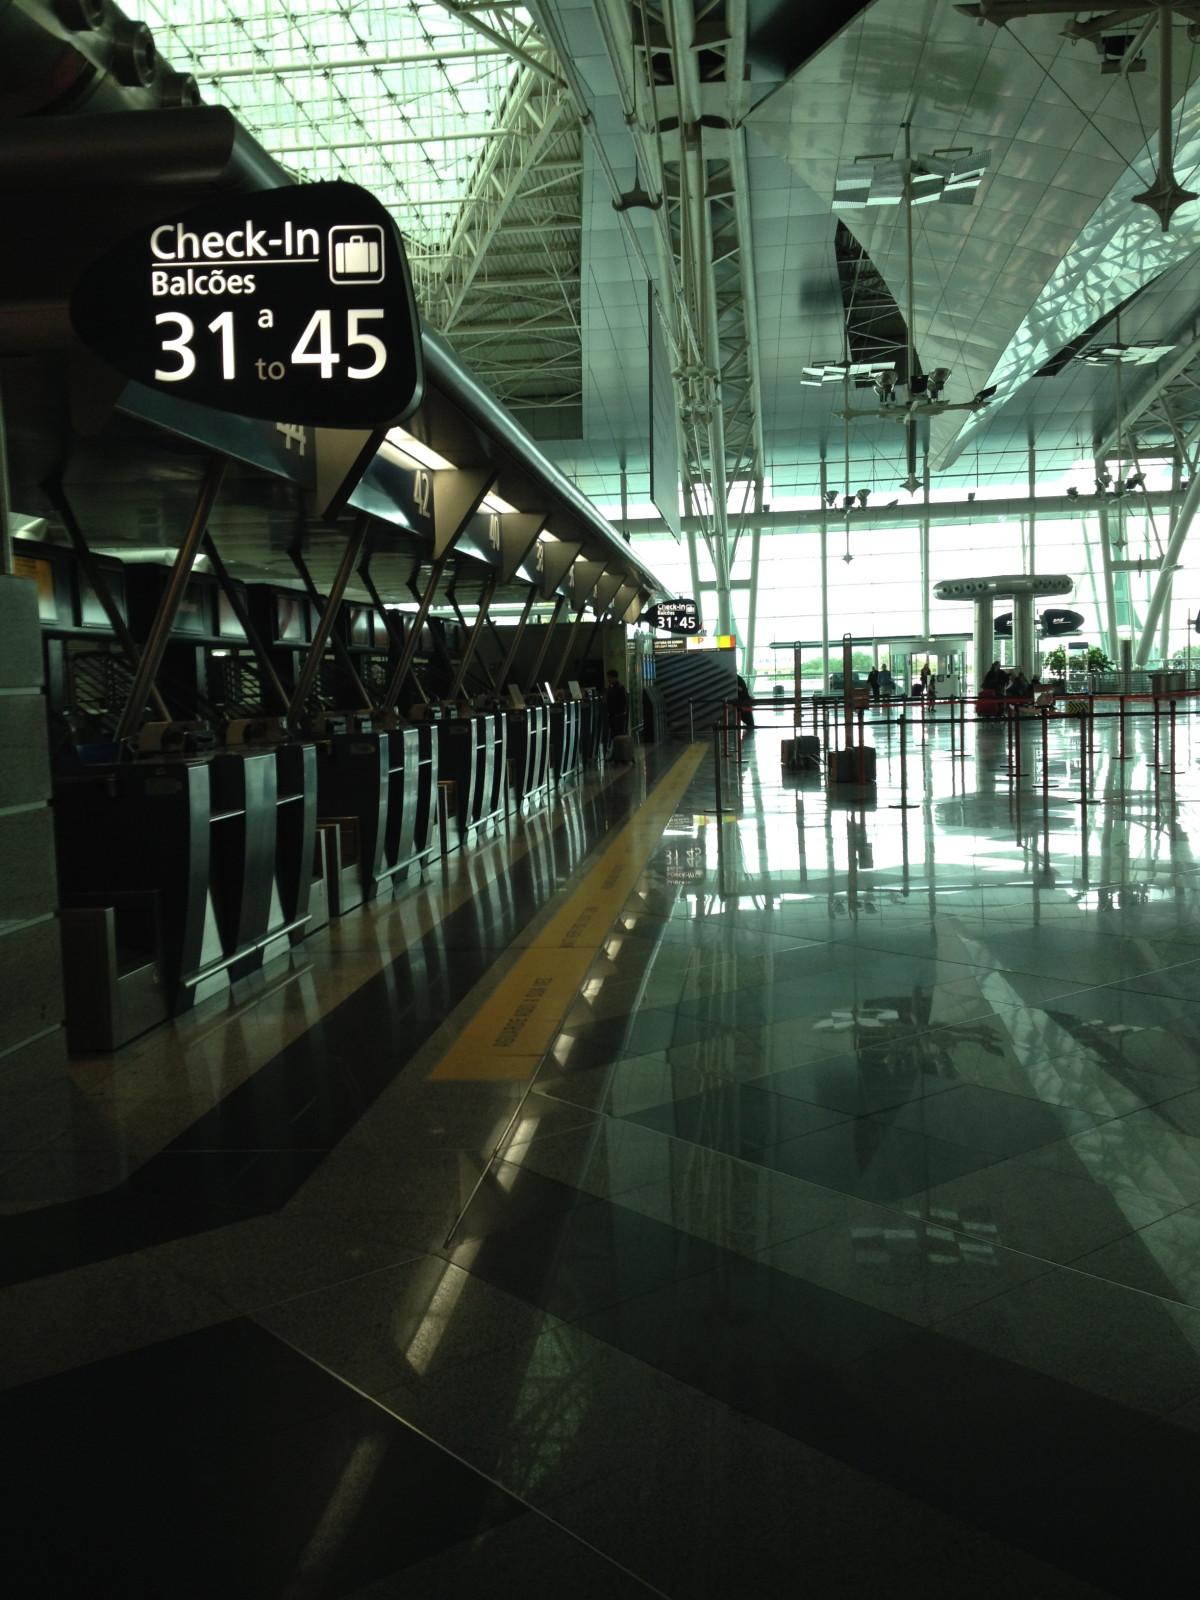 Aeroporto do Porto - Portugal © Viaje Comigo